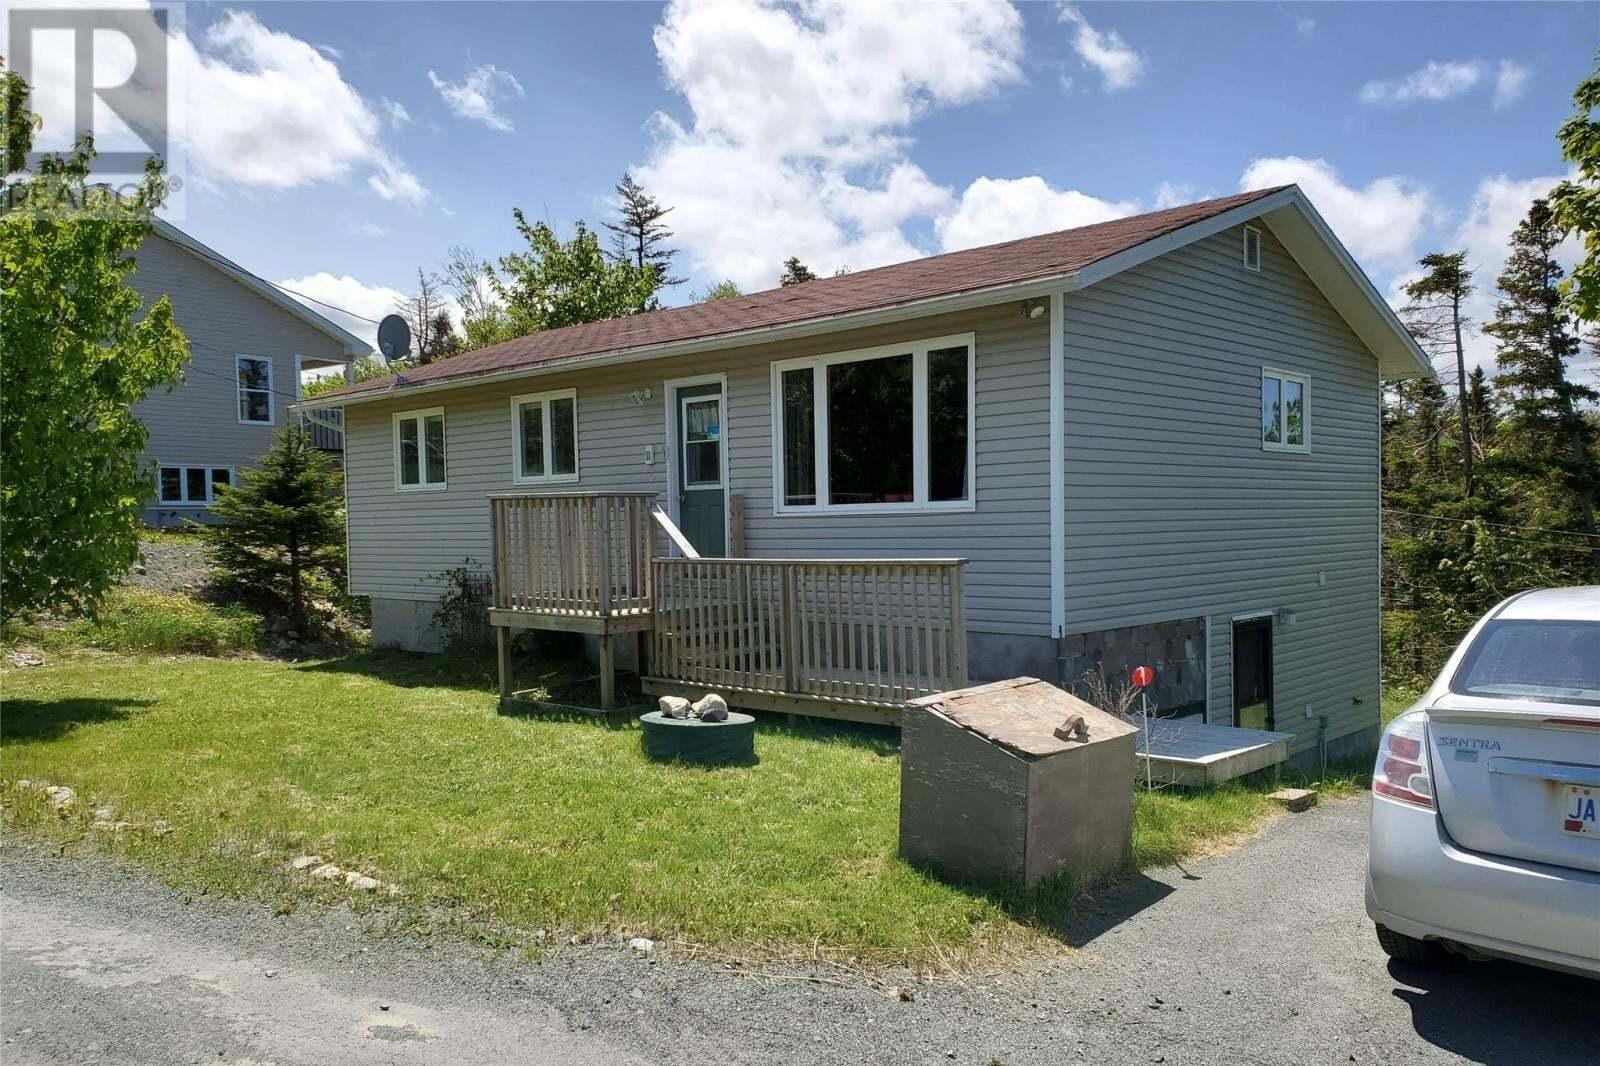 House for sale at 11 Conattie Pl Portugal Cove Newfoundland - MLS: 1198340